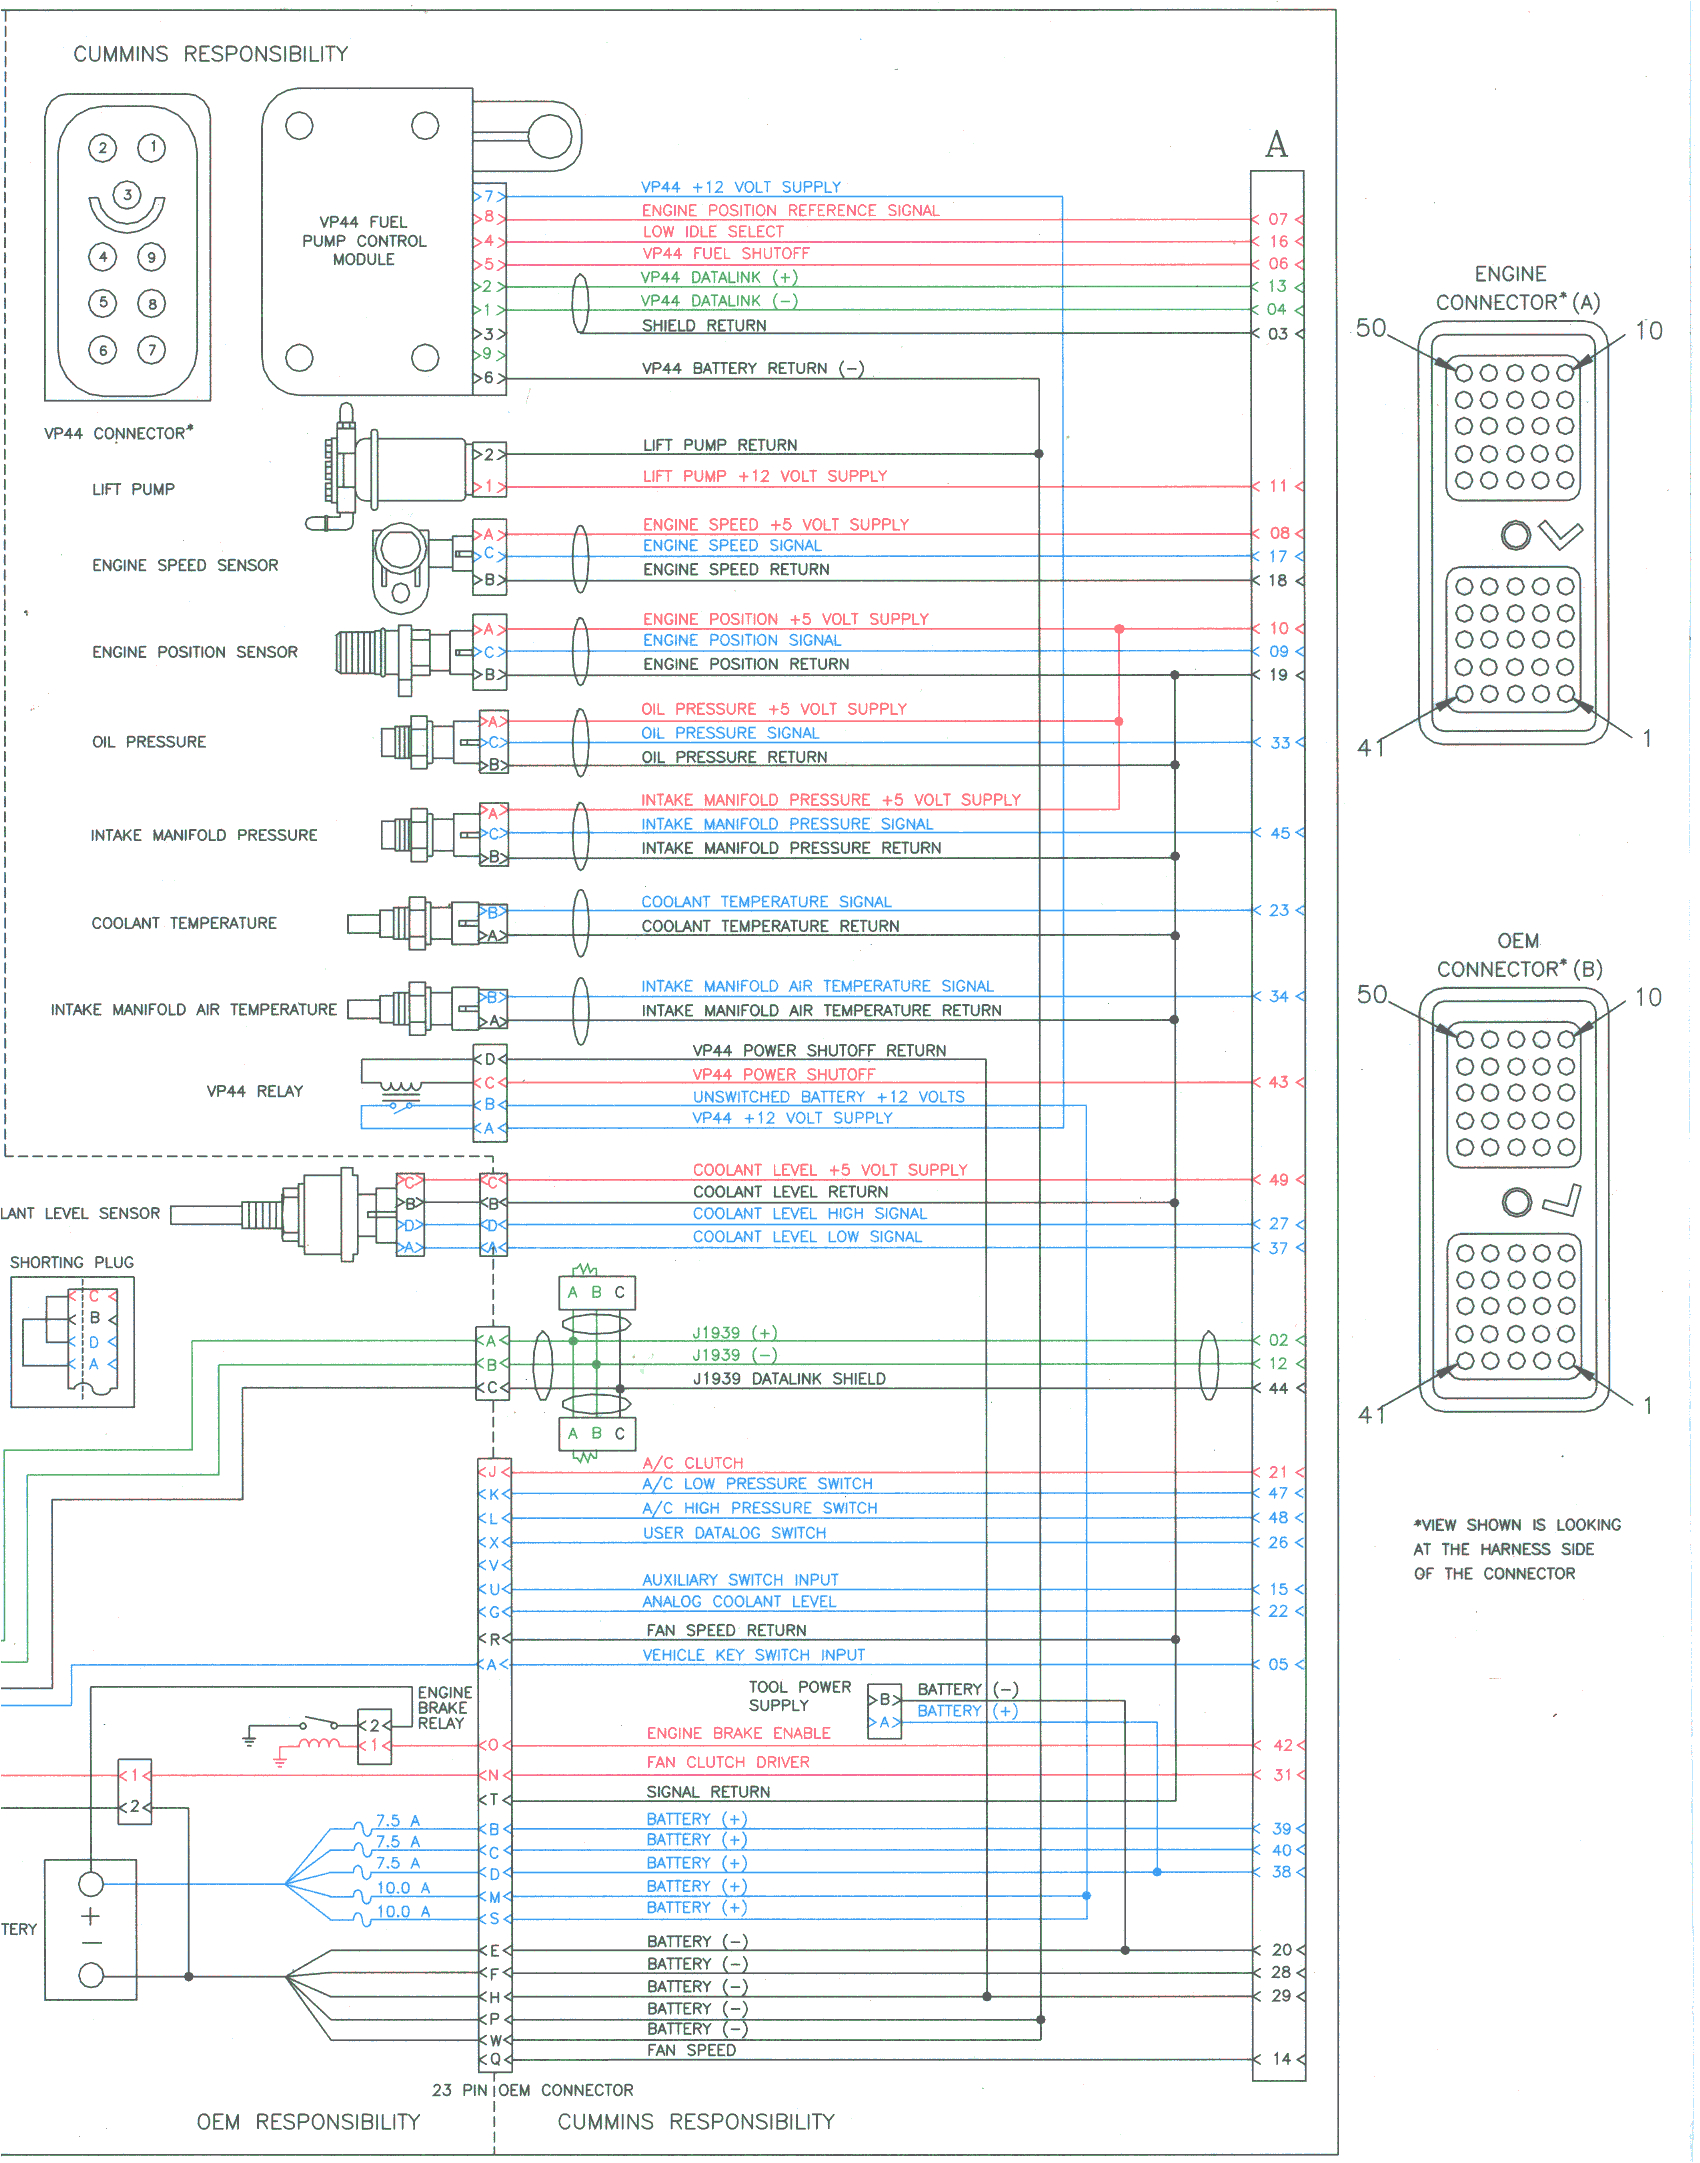 ecm details for 1998 2002 dodge ram trucks with 24 valve cummins 2001 dodge ram 2500 ecm wiring diagram dodge ram ecm wiring diagram